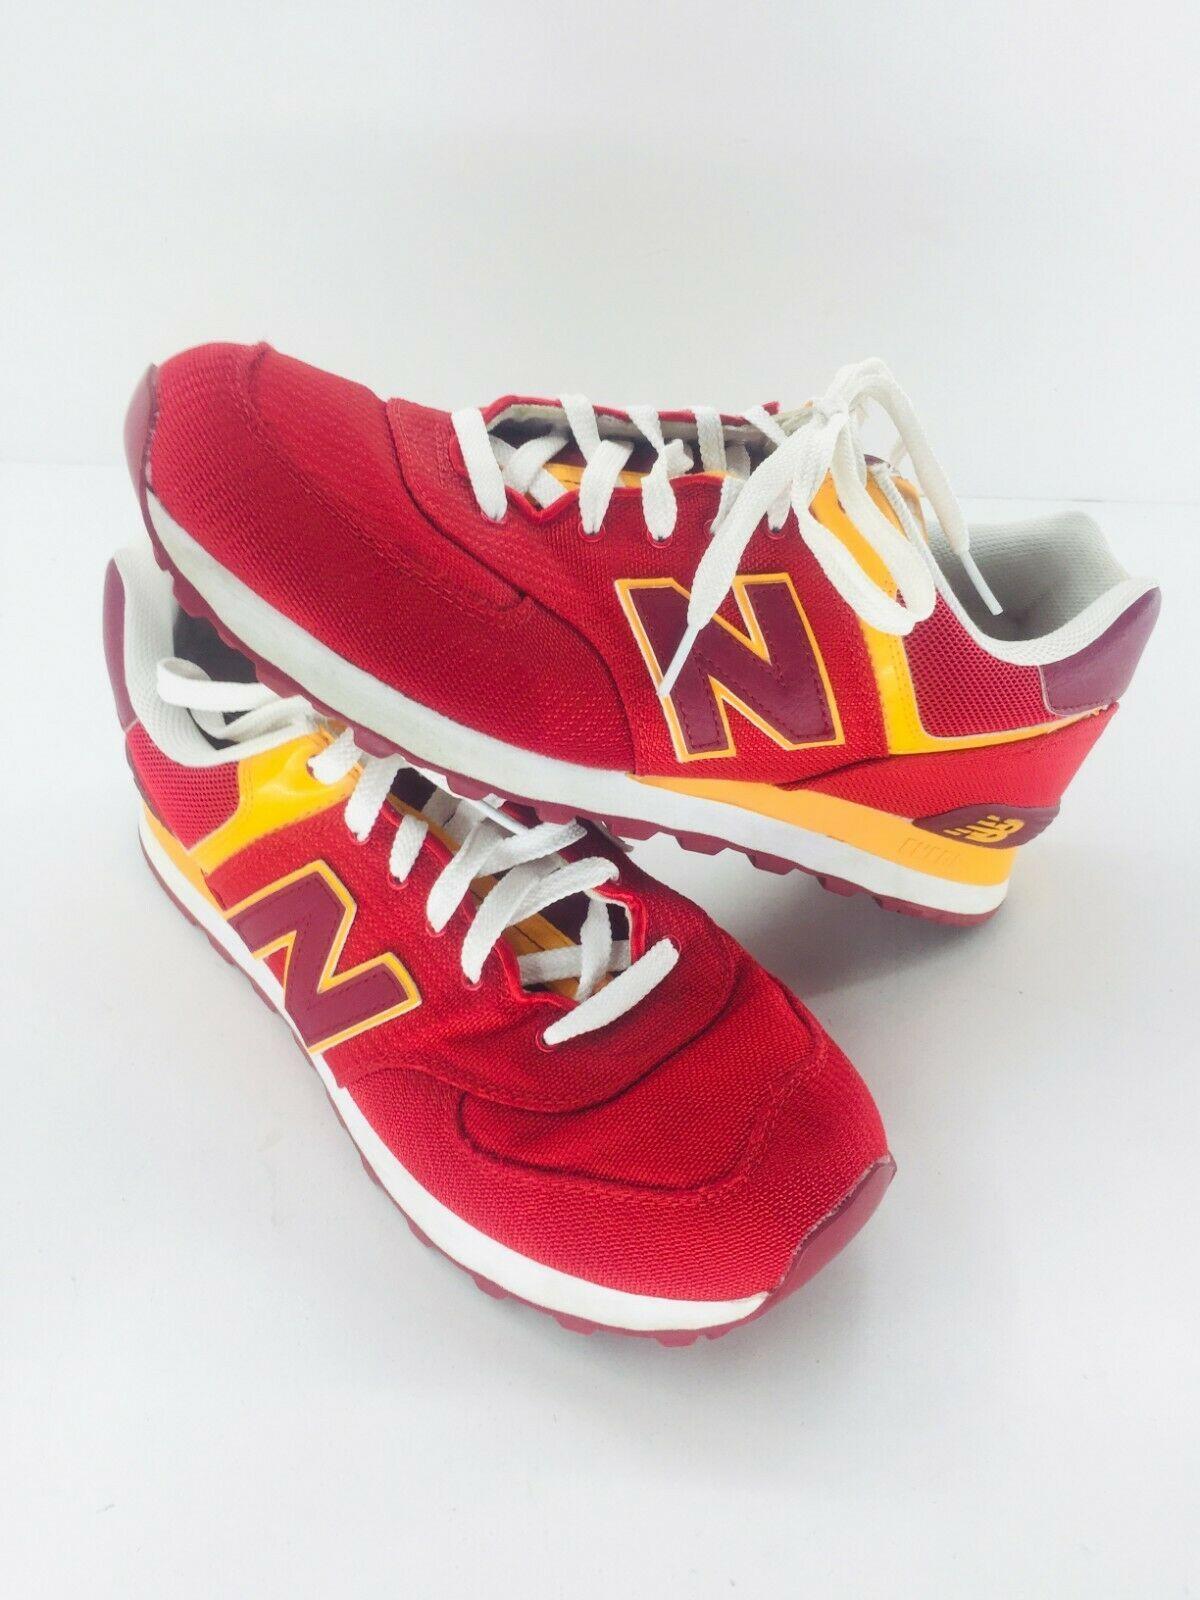 New Balance Athletic Sneaker Shoes Men's Sz 11.5 Red Orange ML574PPR  574 EUC